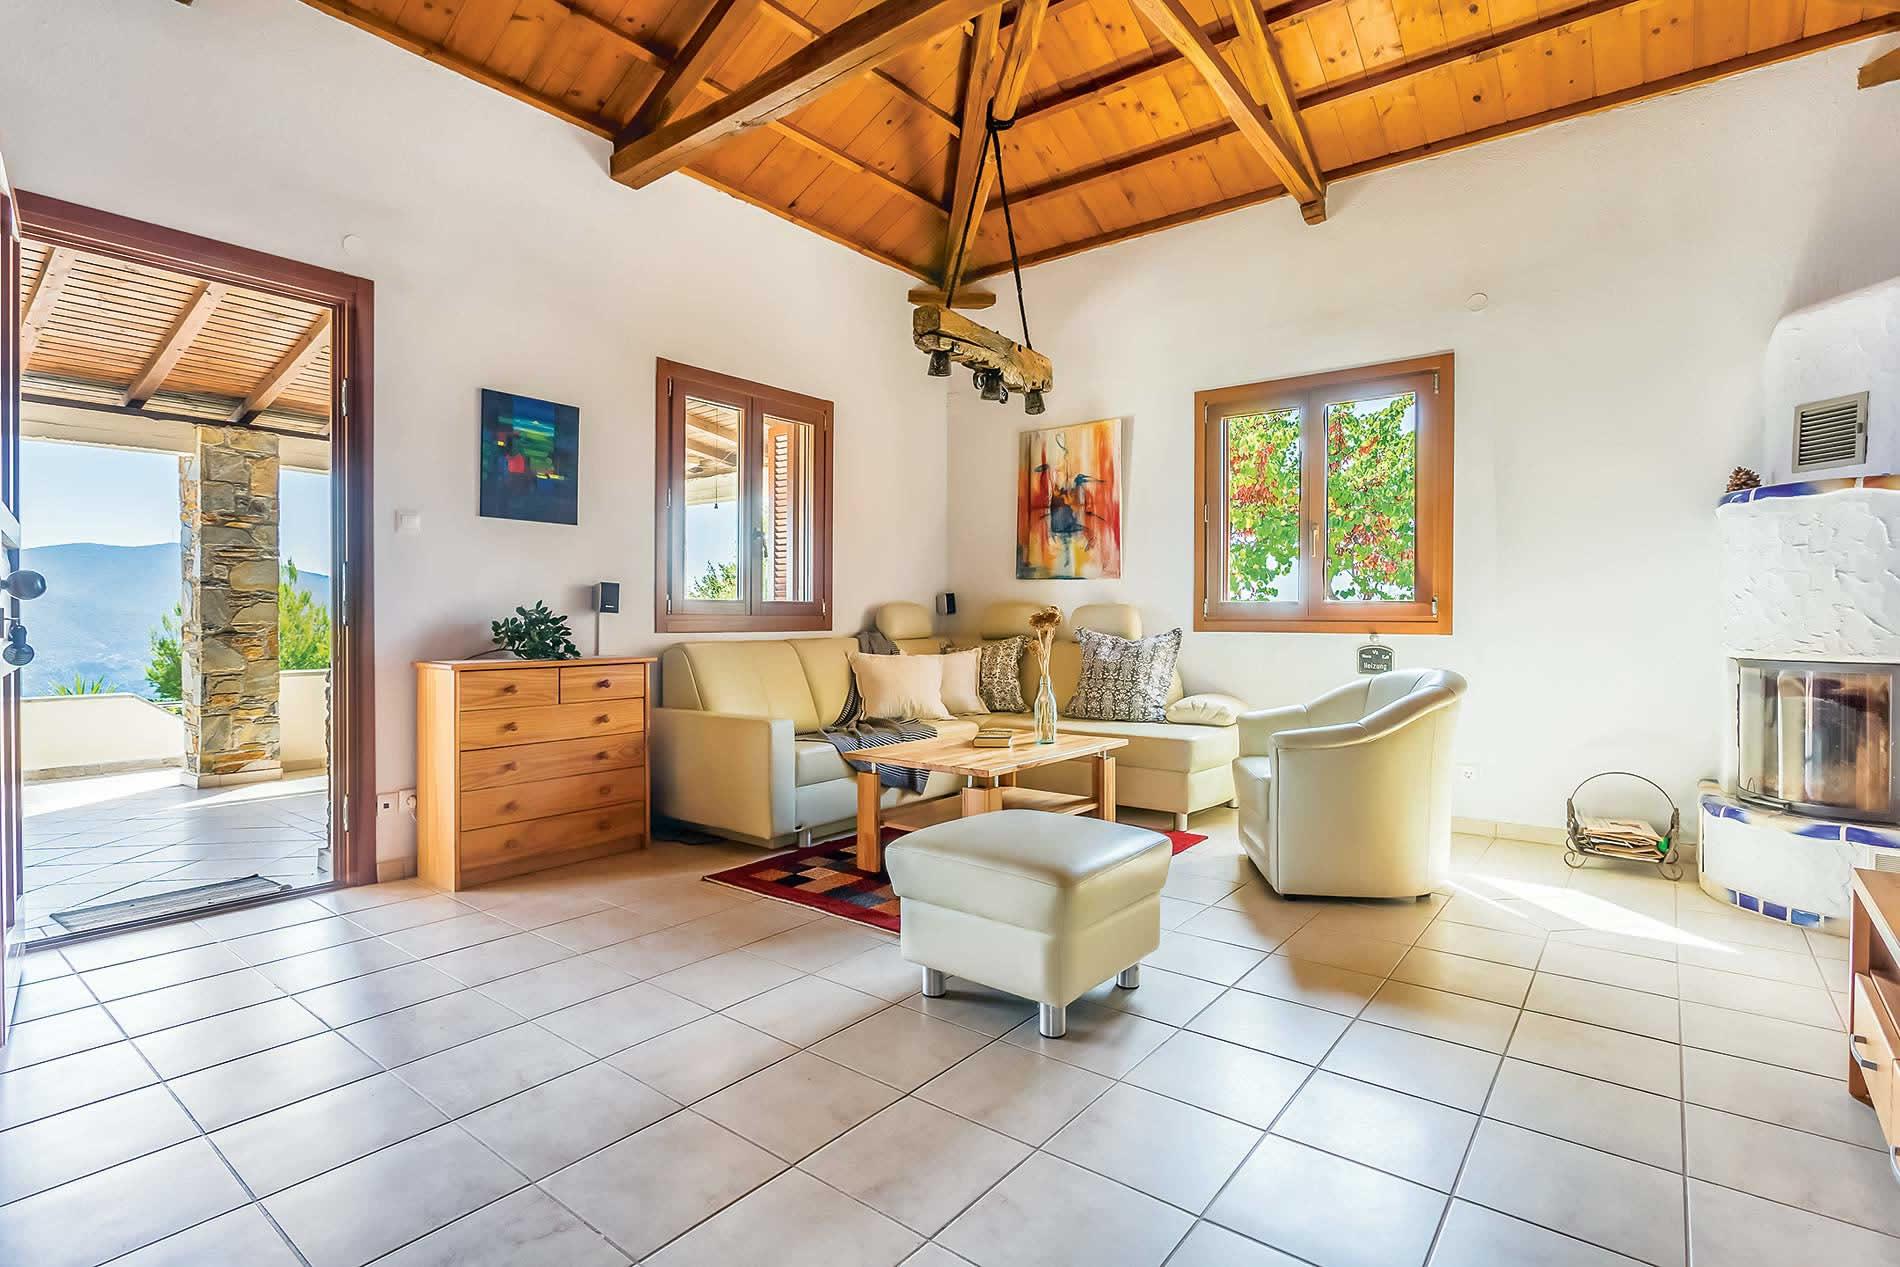 Villa Lavanda in Raches - sleeps 2 people